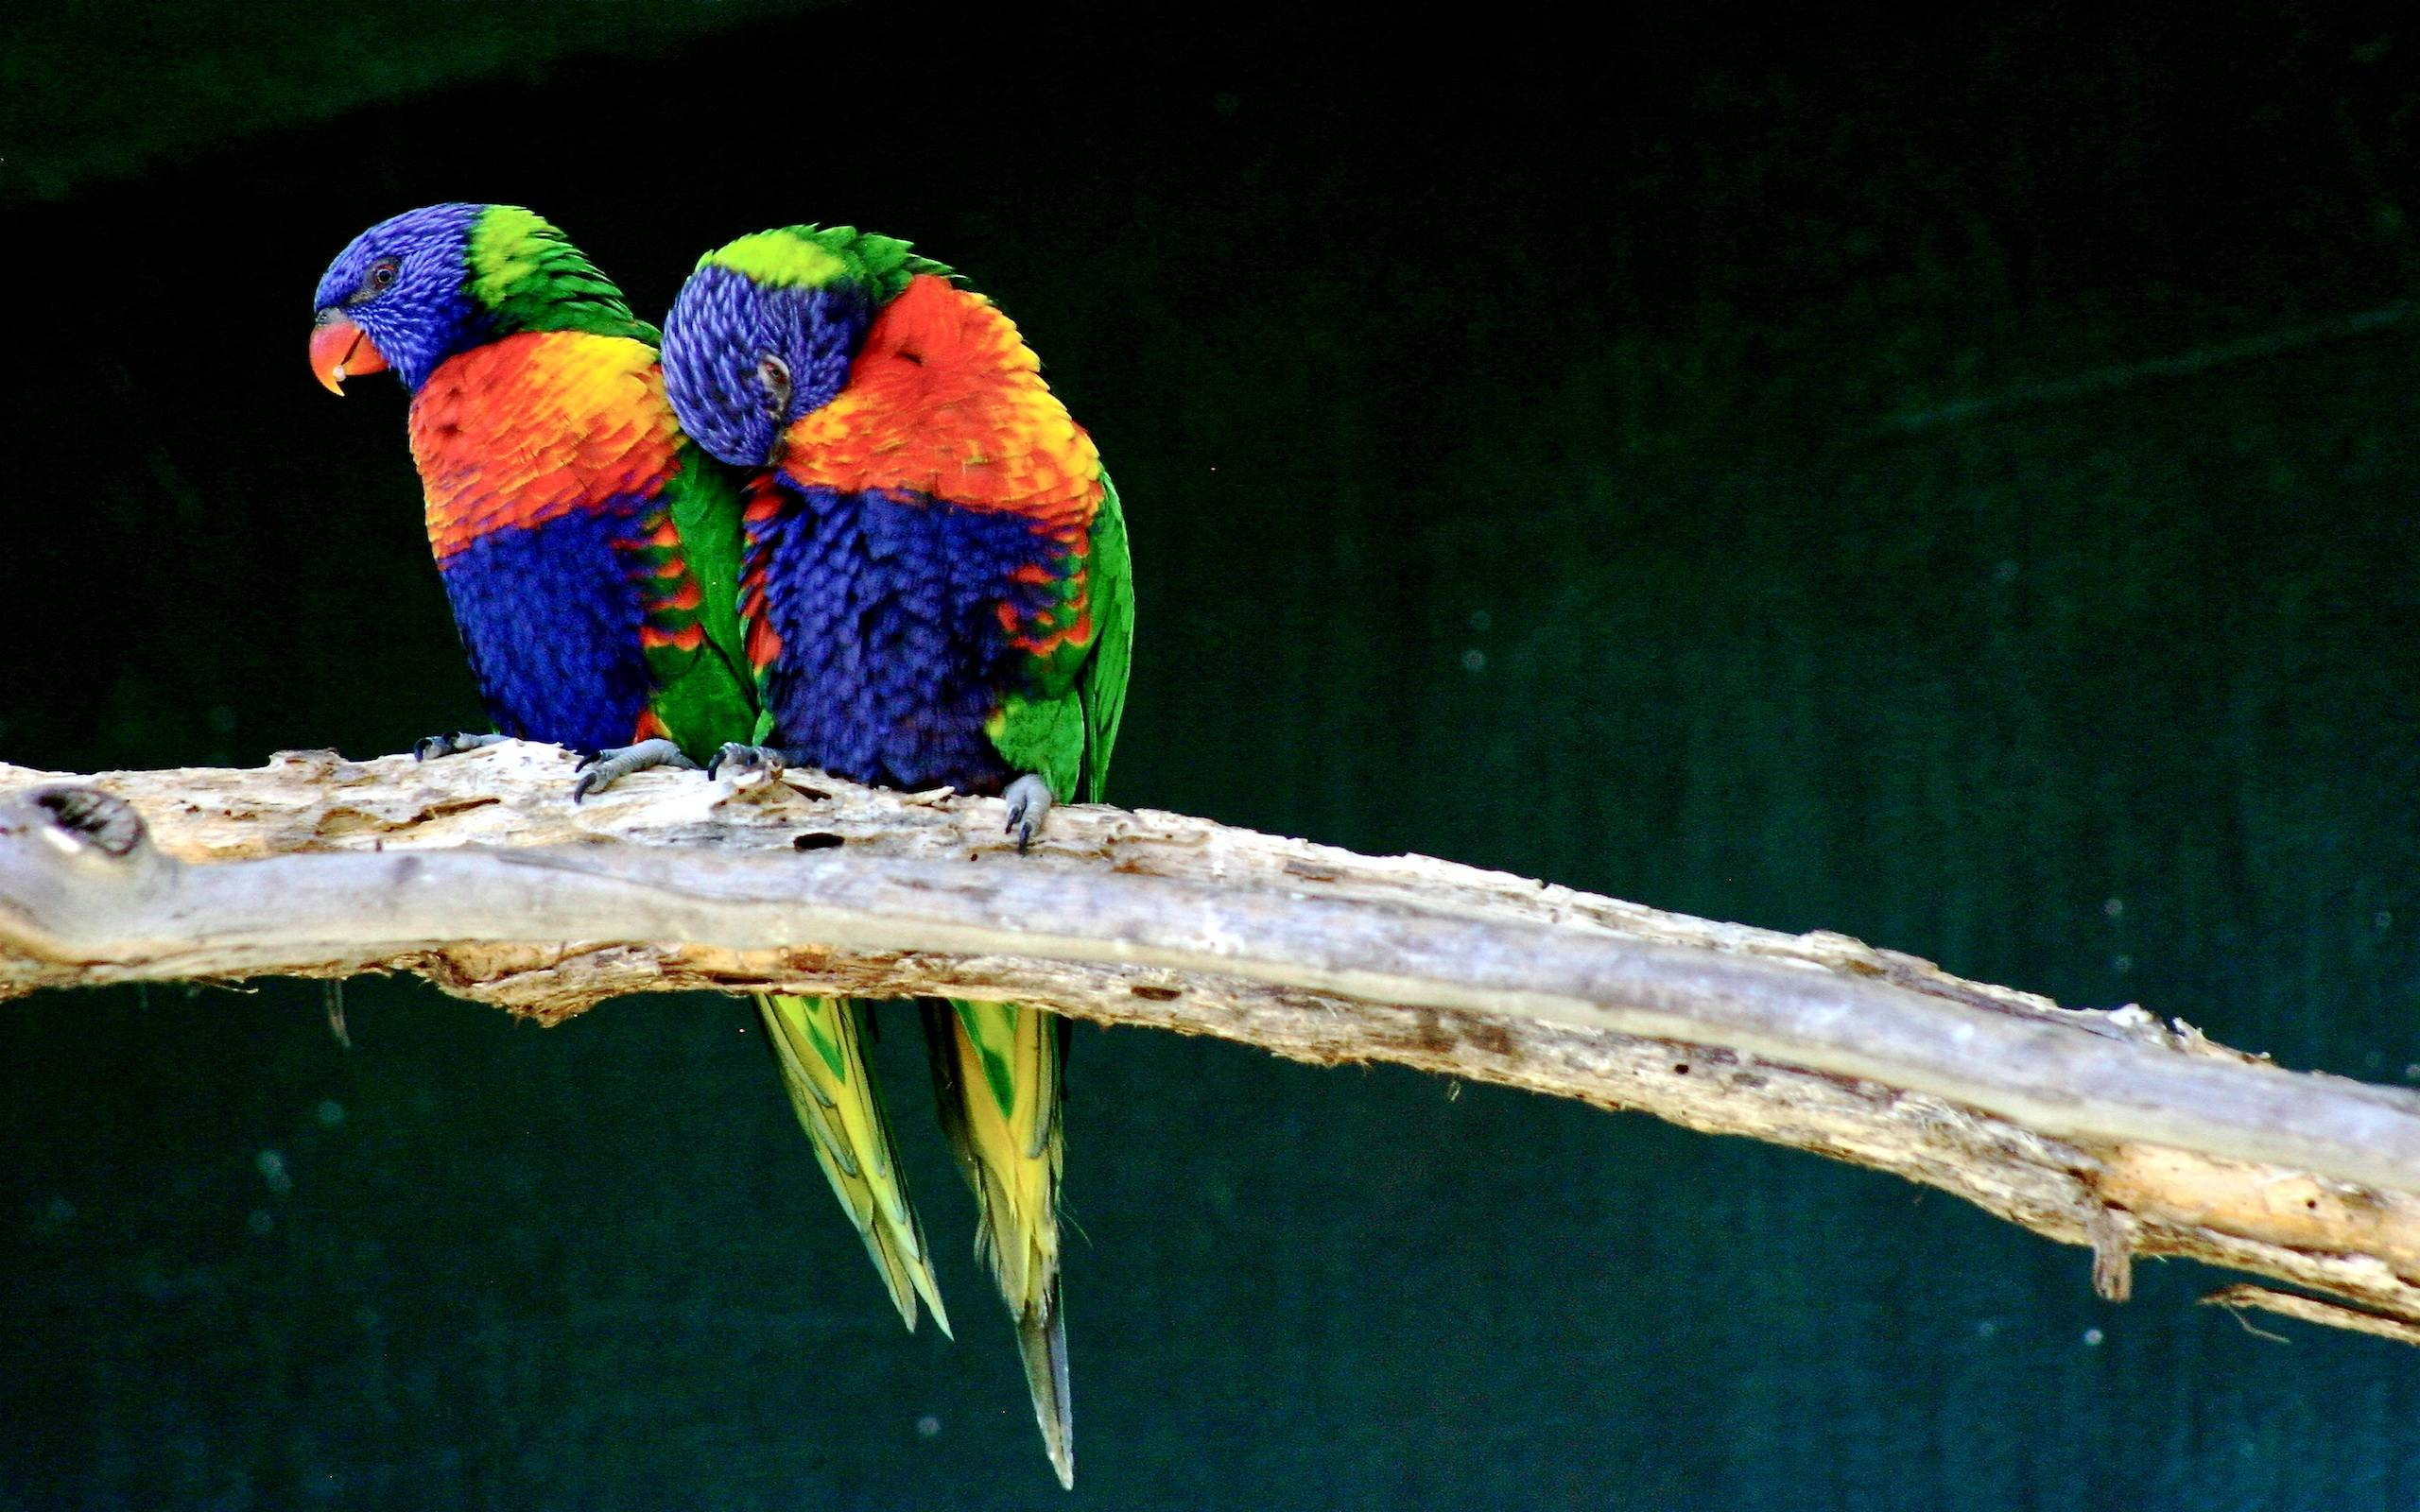 Best Wallpaper Love Bird - lPkb0oJ  Gallery_487084.jpg